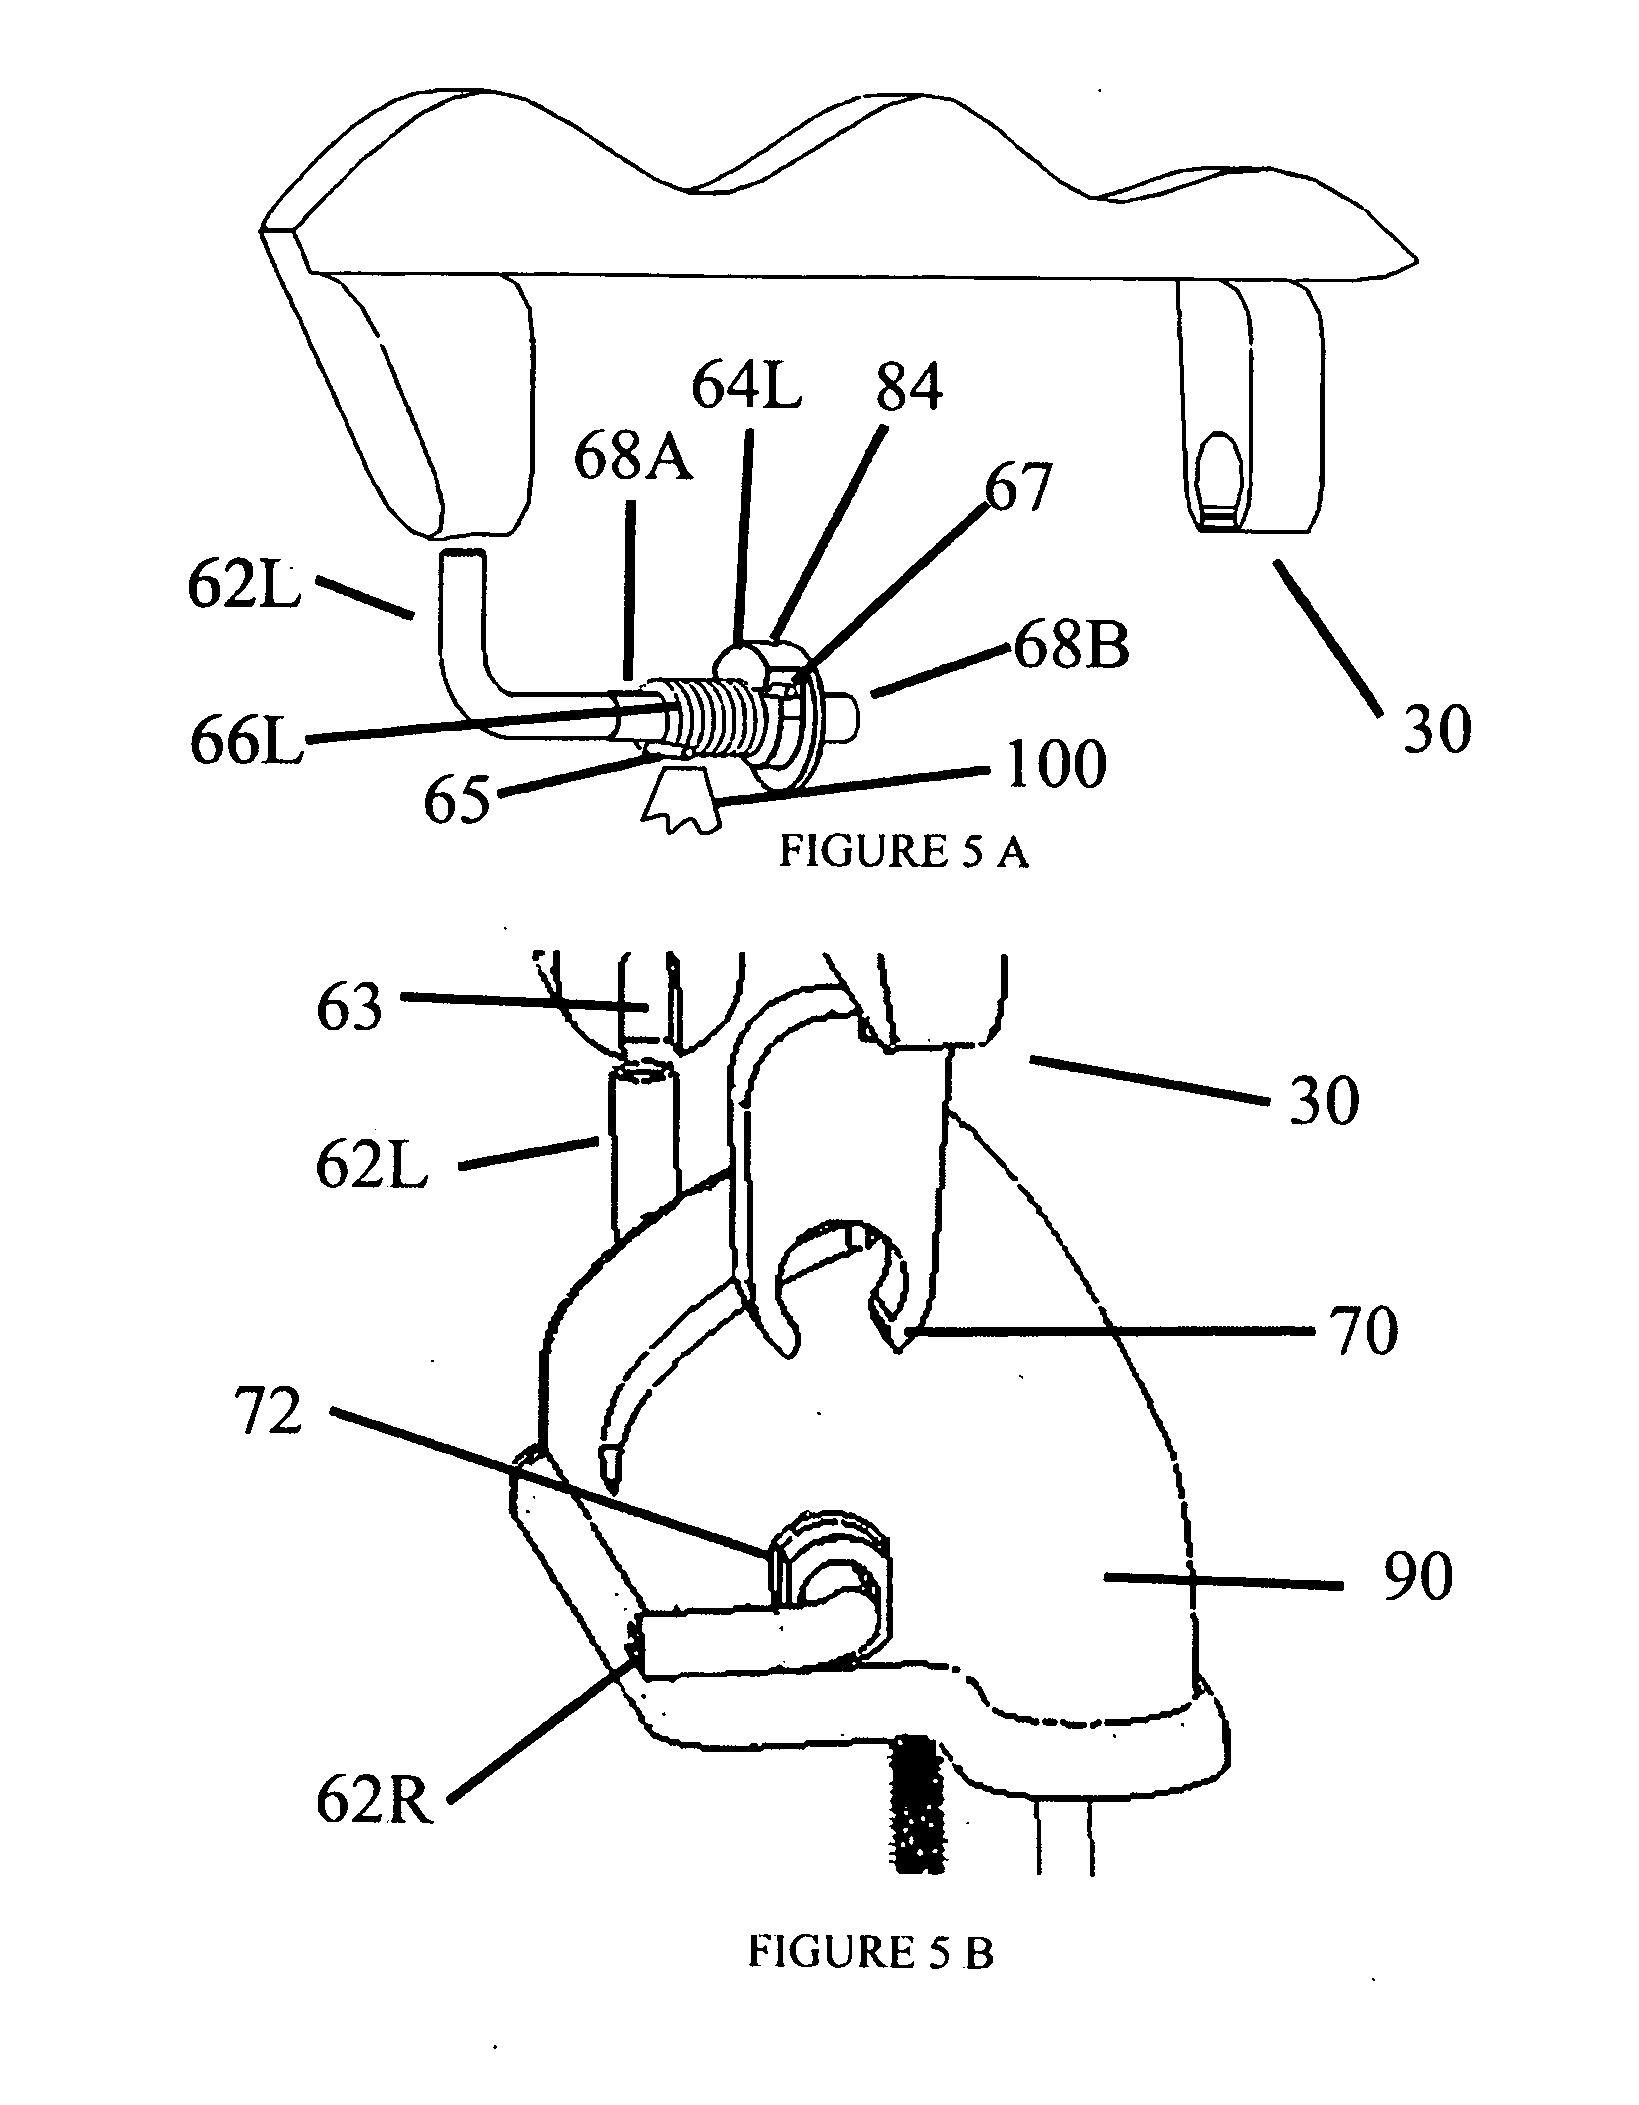 hight resolution of 64l belt diagram wiring diagrams scematic john deere belt routing diagrams 64l belt diagram